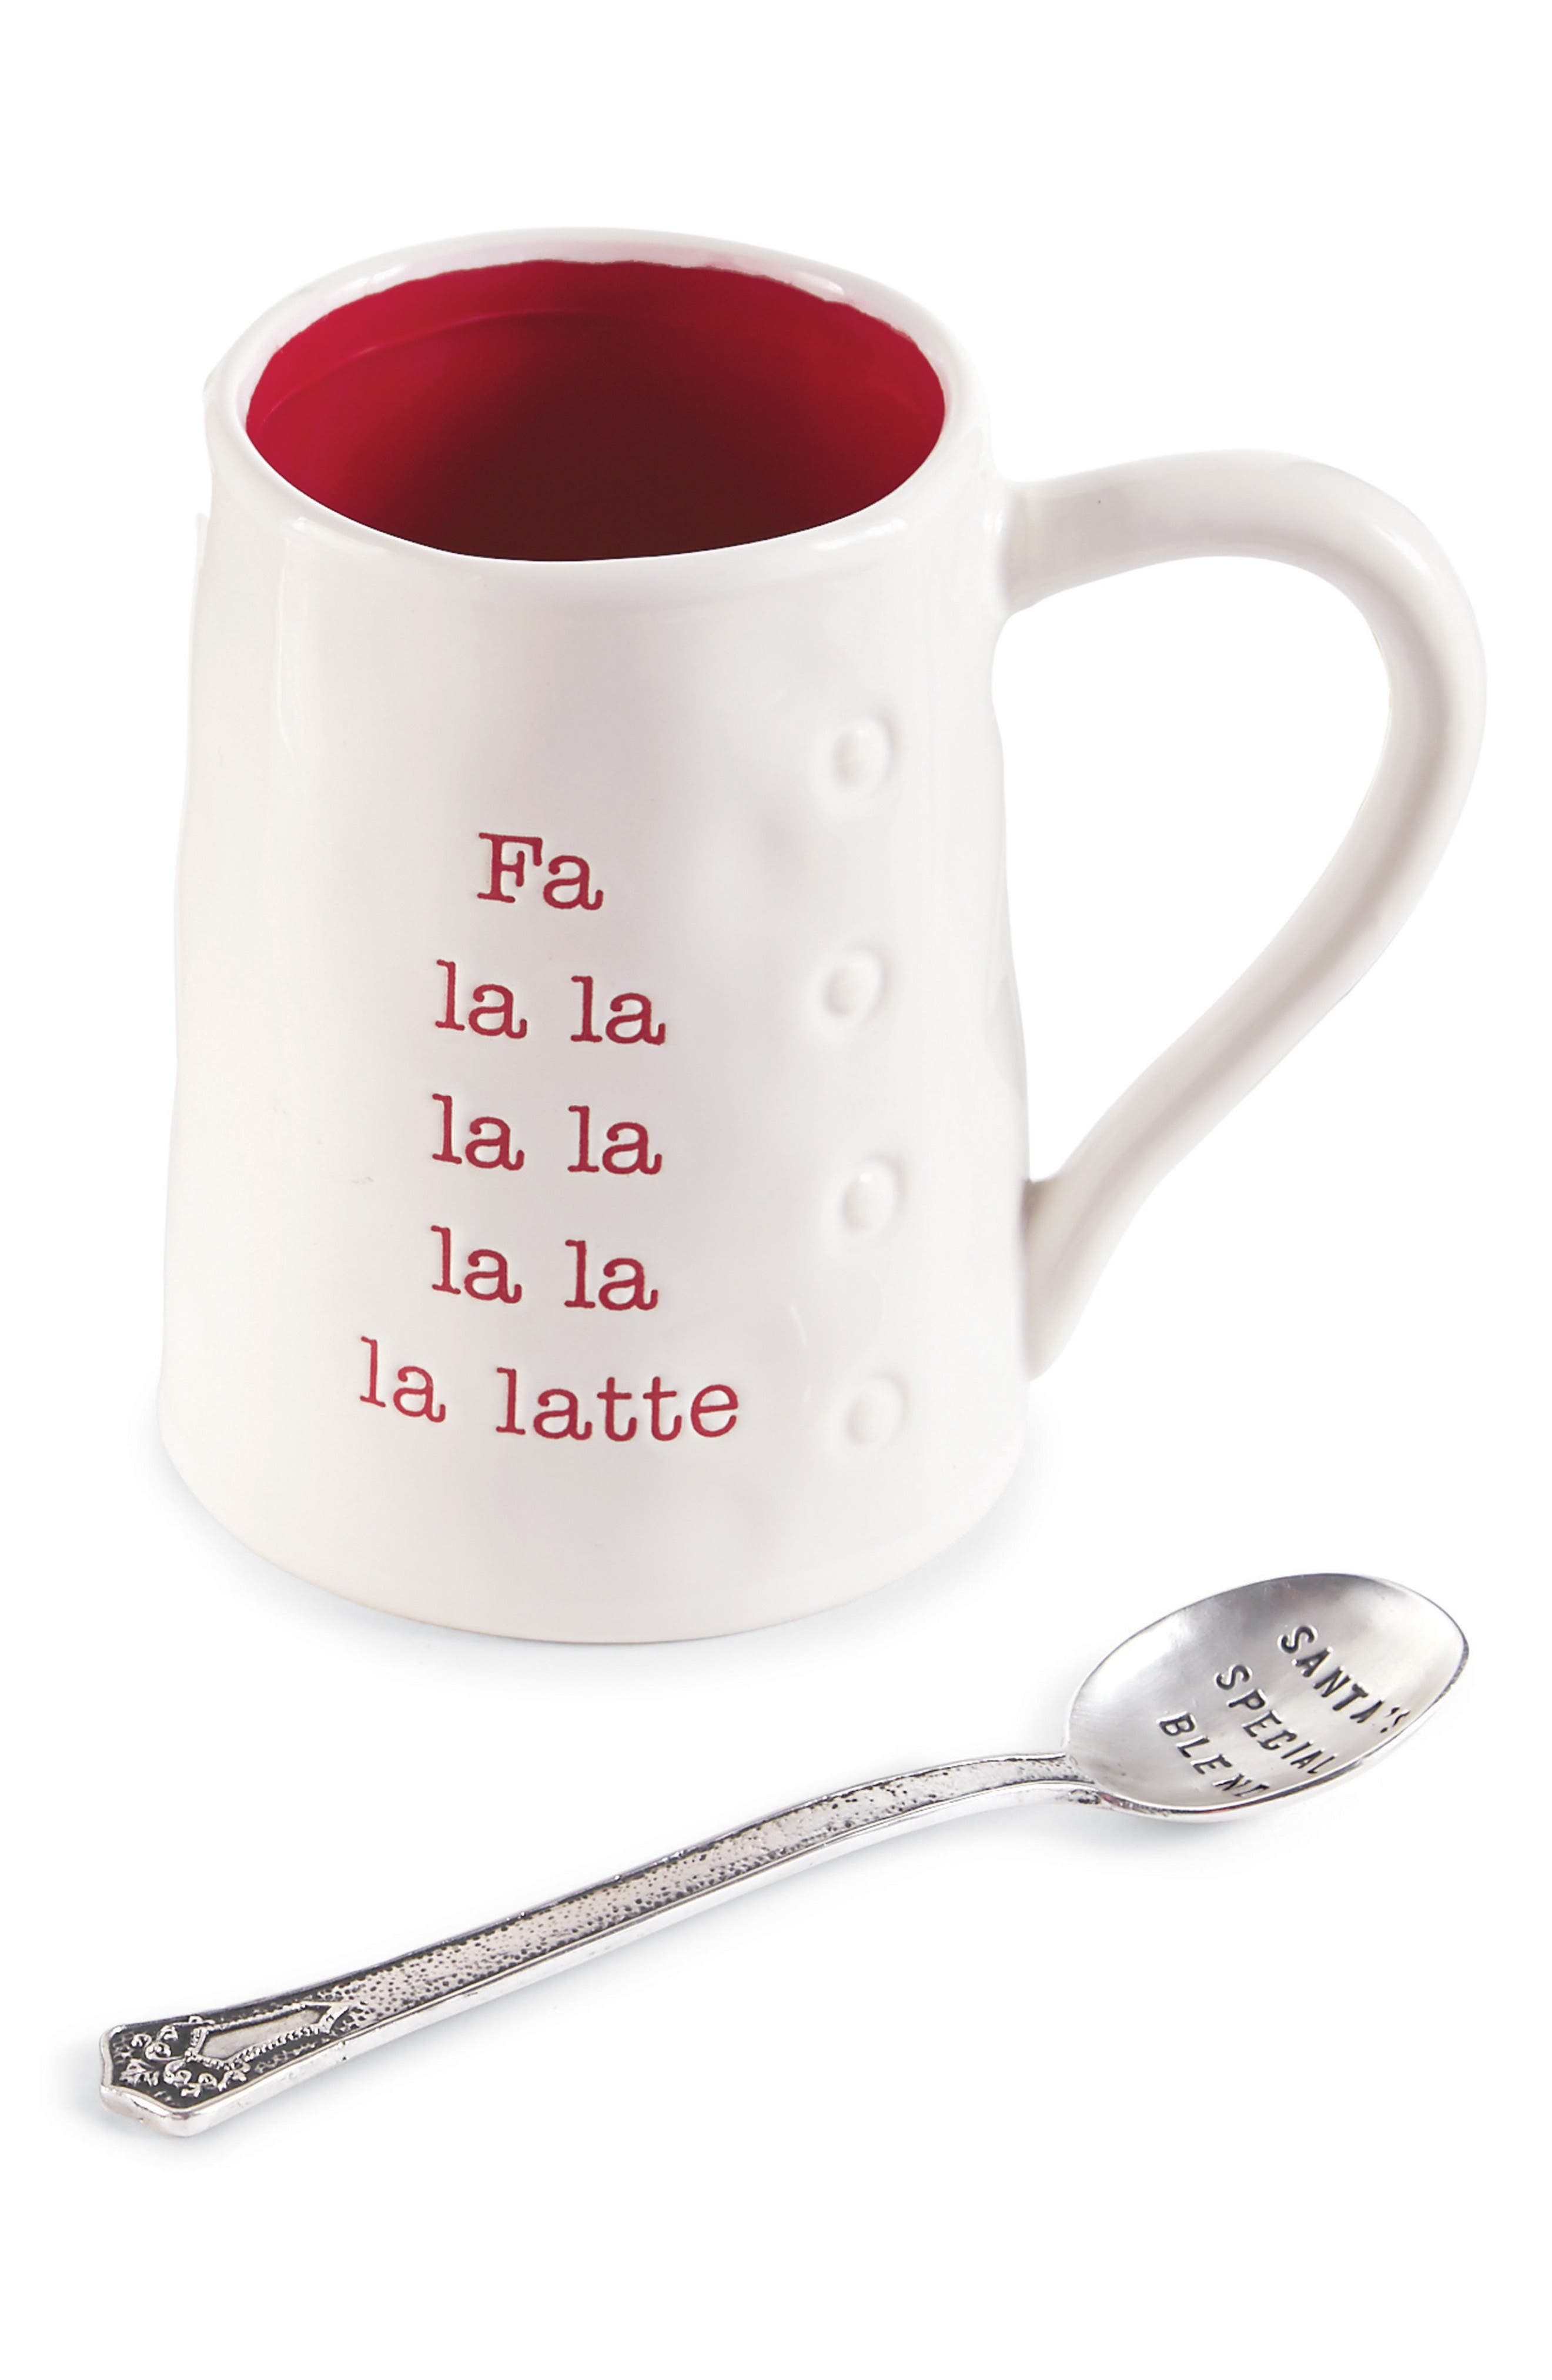 Mud Pie Fa La Latte Ceramic Mug & Spoon